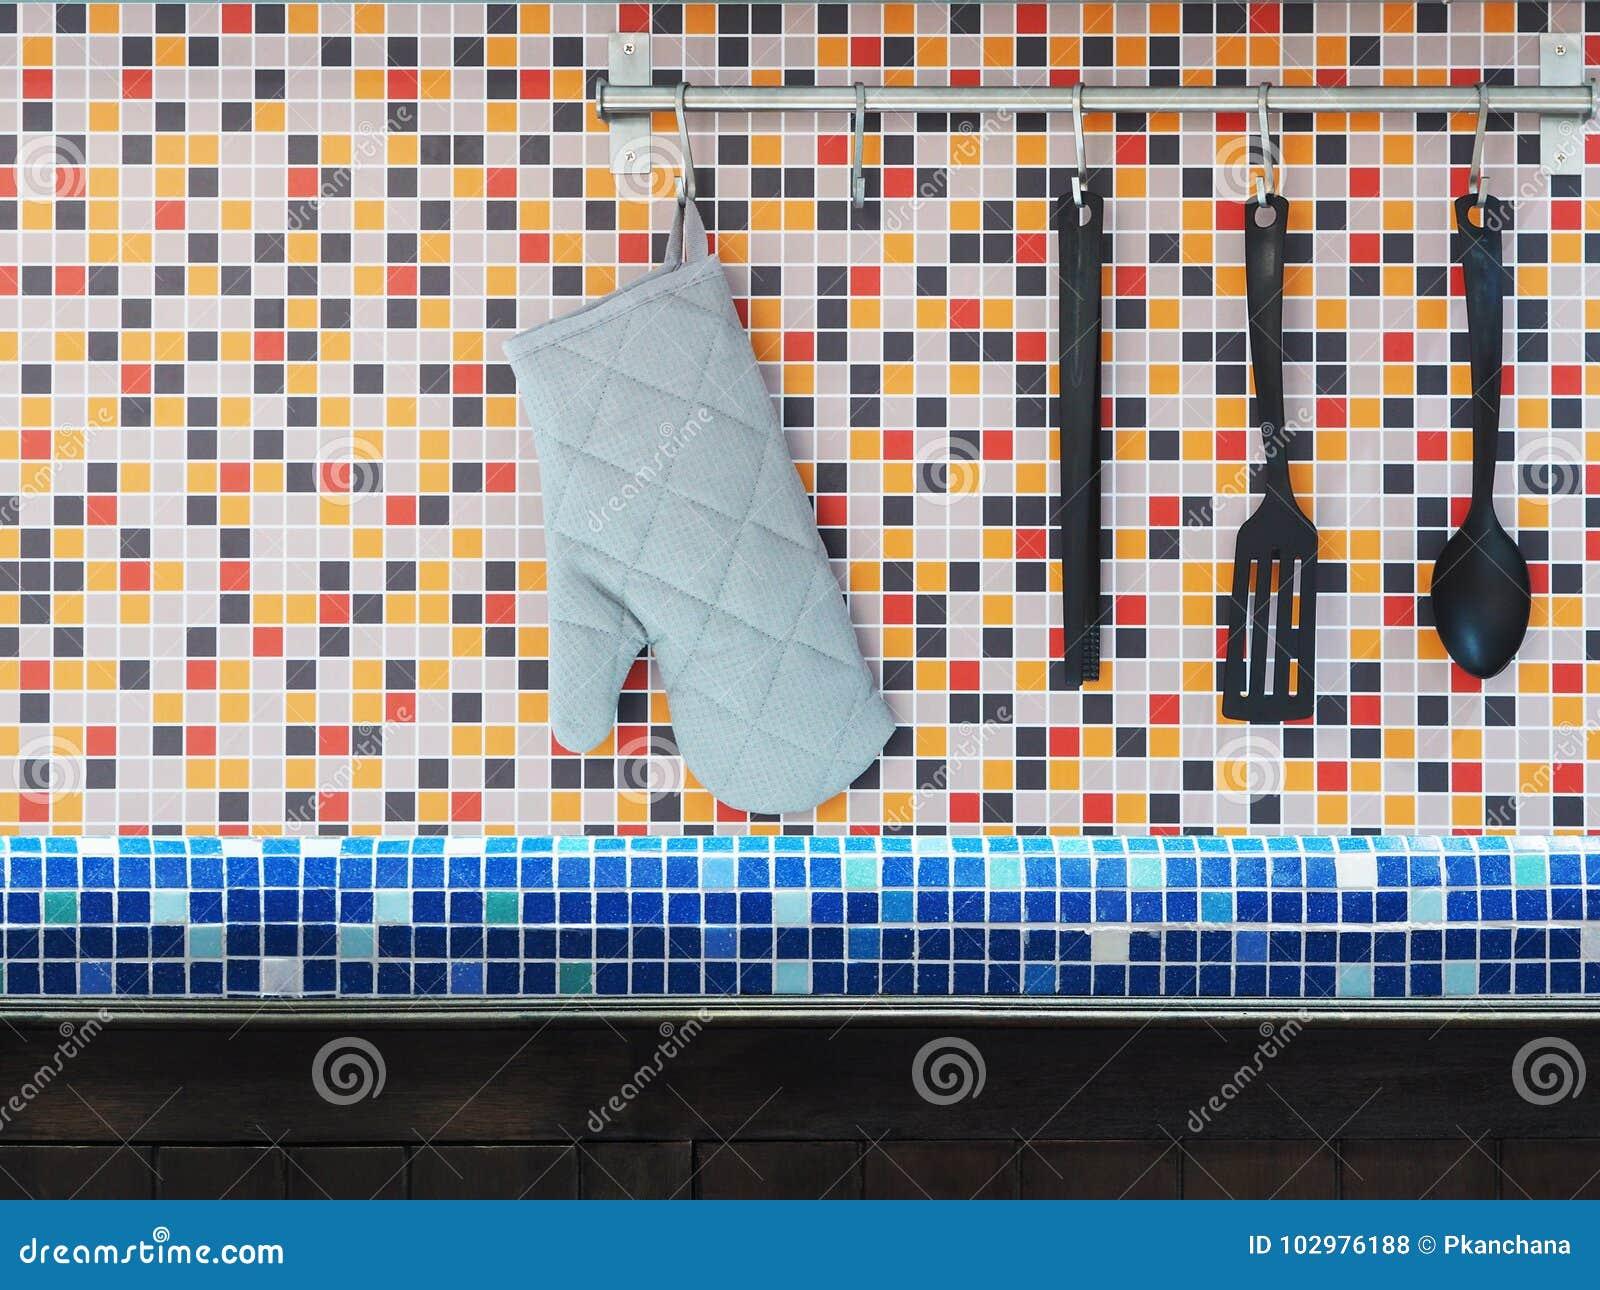 Mattonelle mosaico cucina emejing mosaico cucina for Mattonelle mosaico cucina